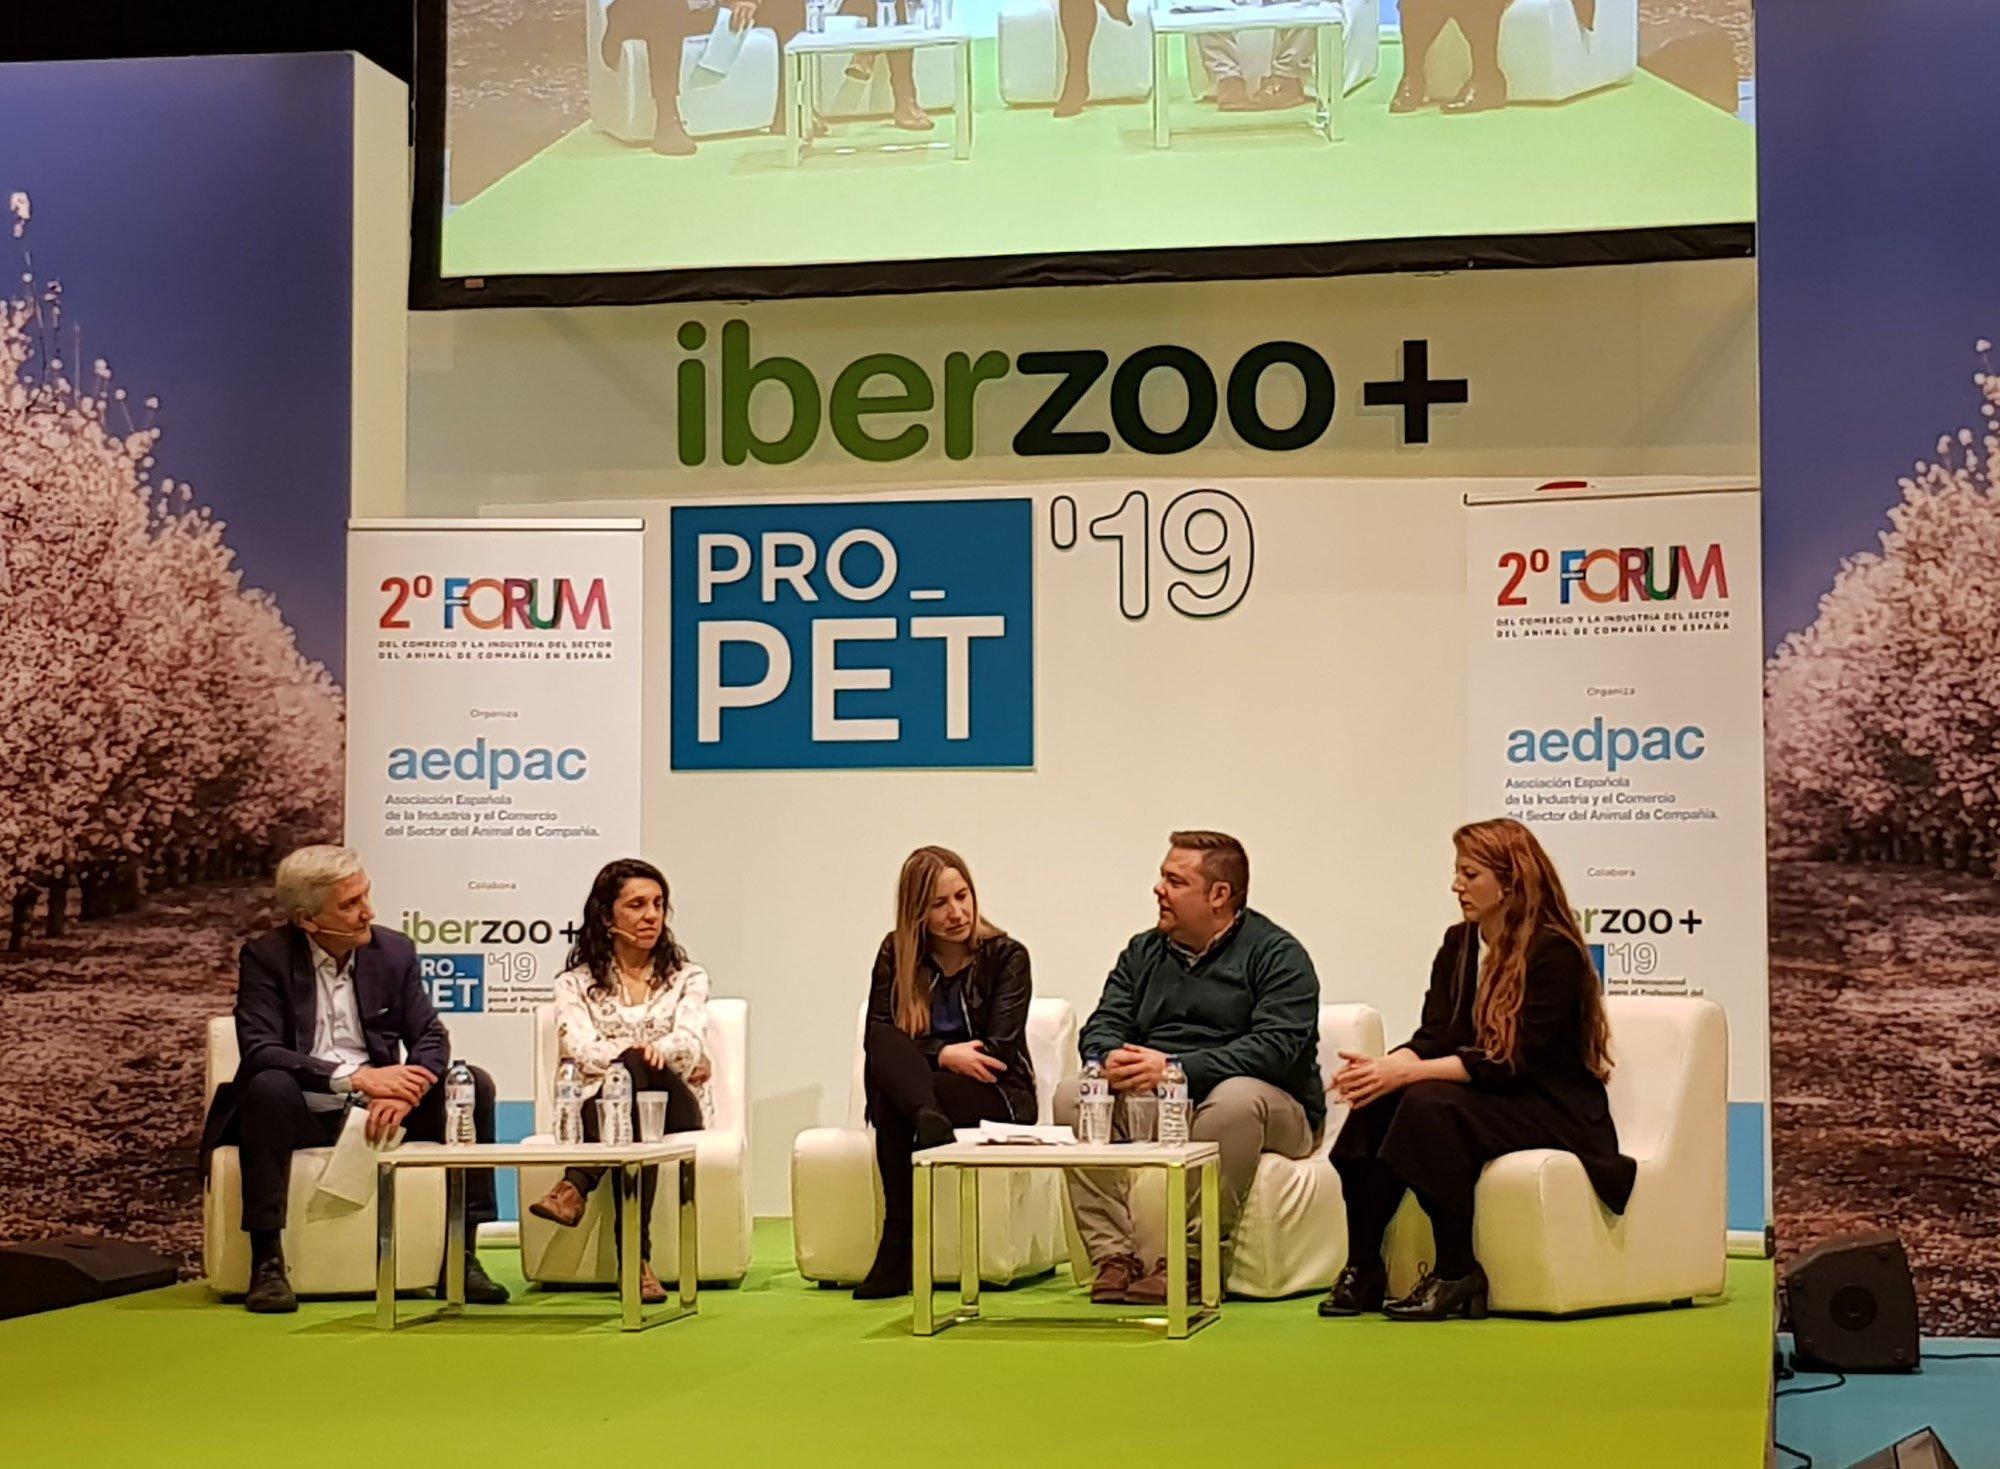 Iberzoo + Propet 19